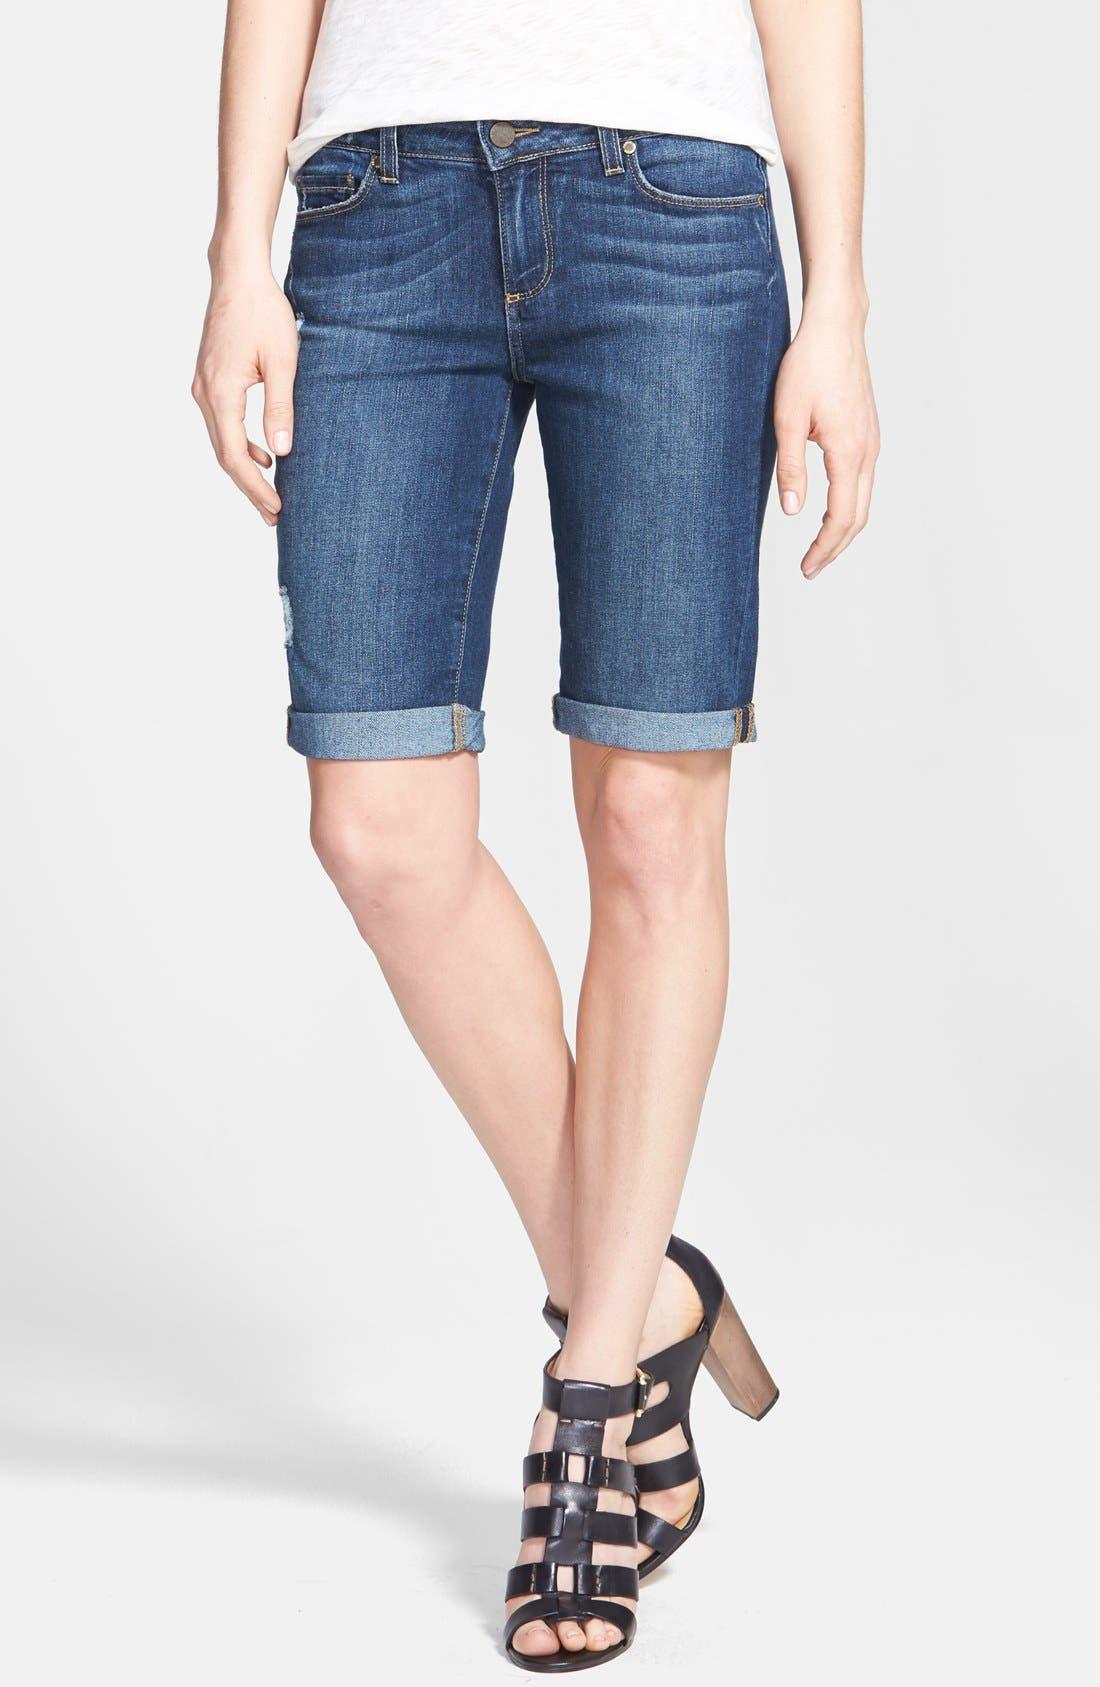 Alternate Image 1 Selected - Paige Denim 'Jax' Cuffed Denim Knee Shorts (Luca)